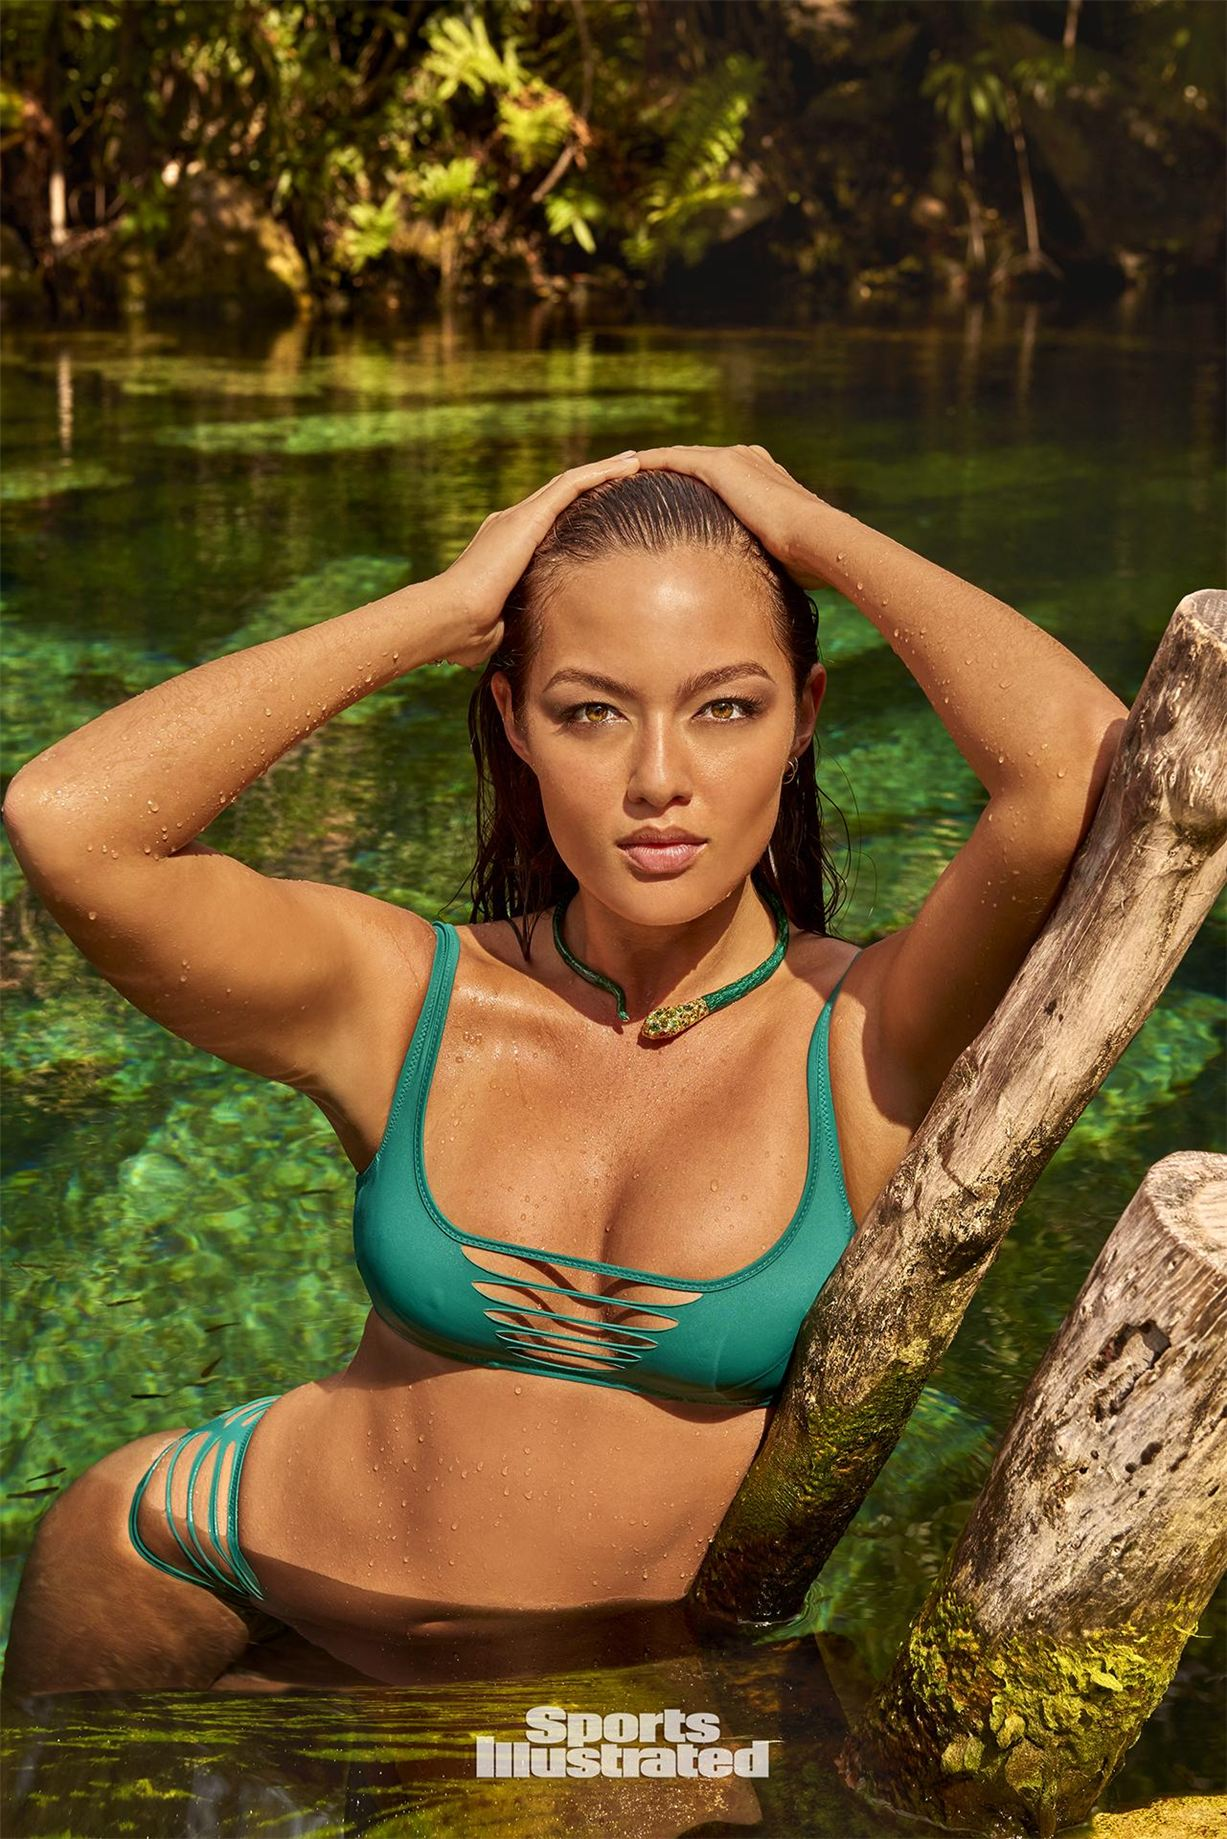 Модель и боец муай тай Мия Кан снялась для журнала Sports Illustrated